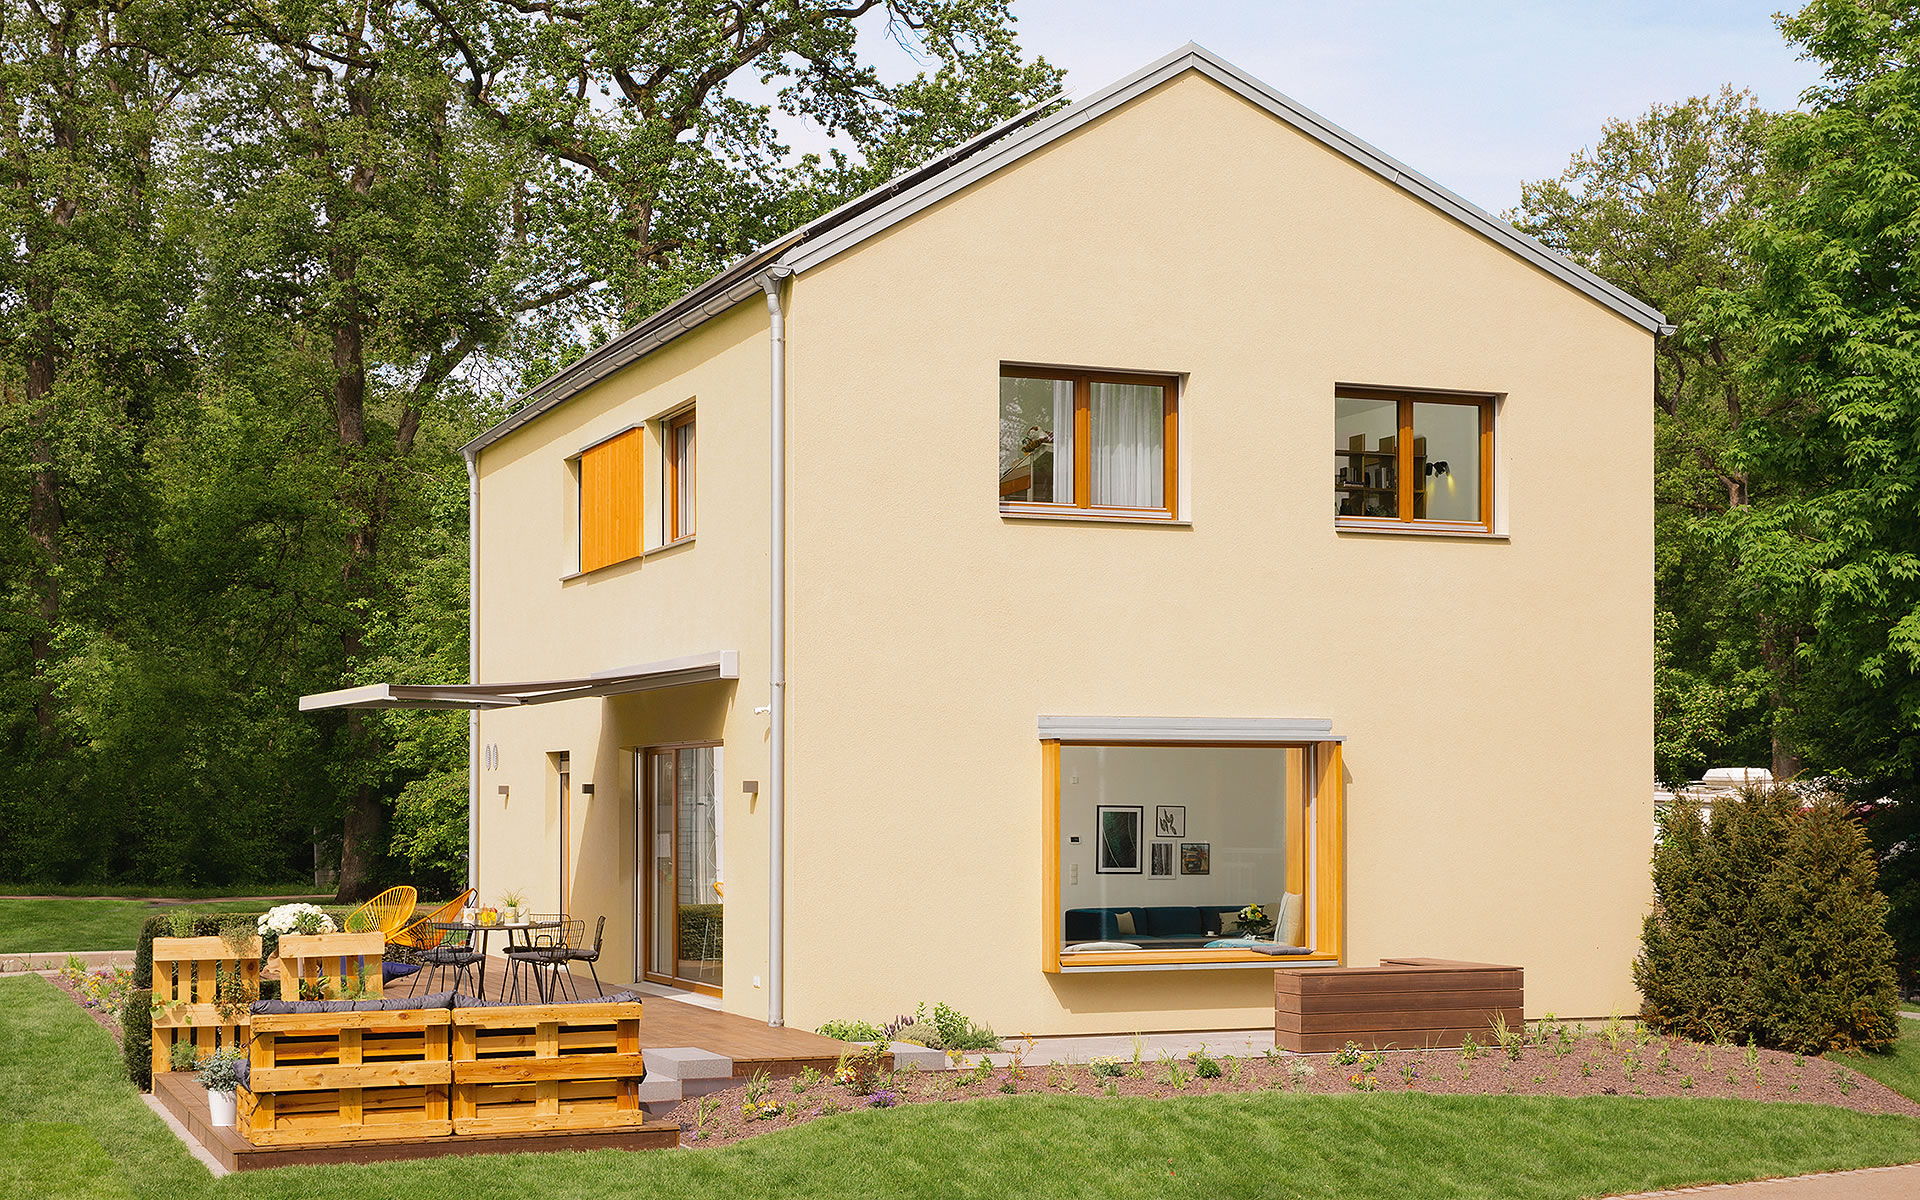 Musterhaus Rheinau-Linx (sunshine) von WeberHaus GmbH & Co. KG